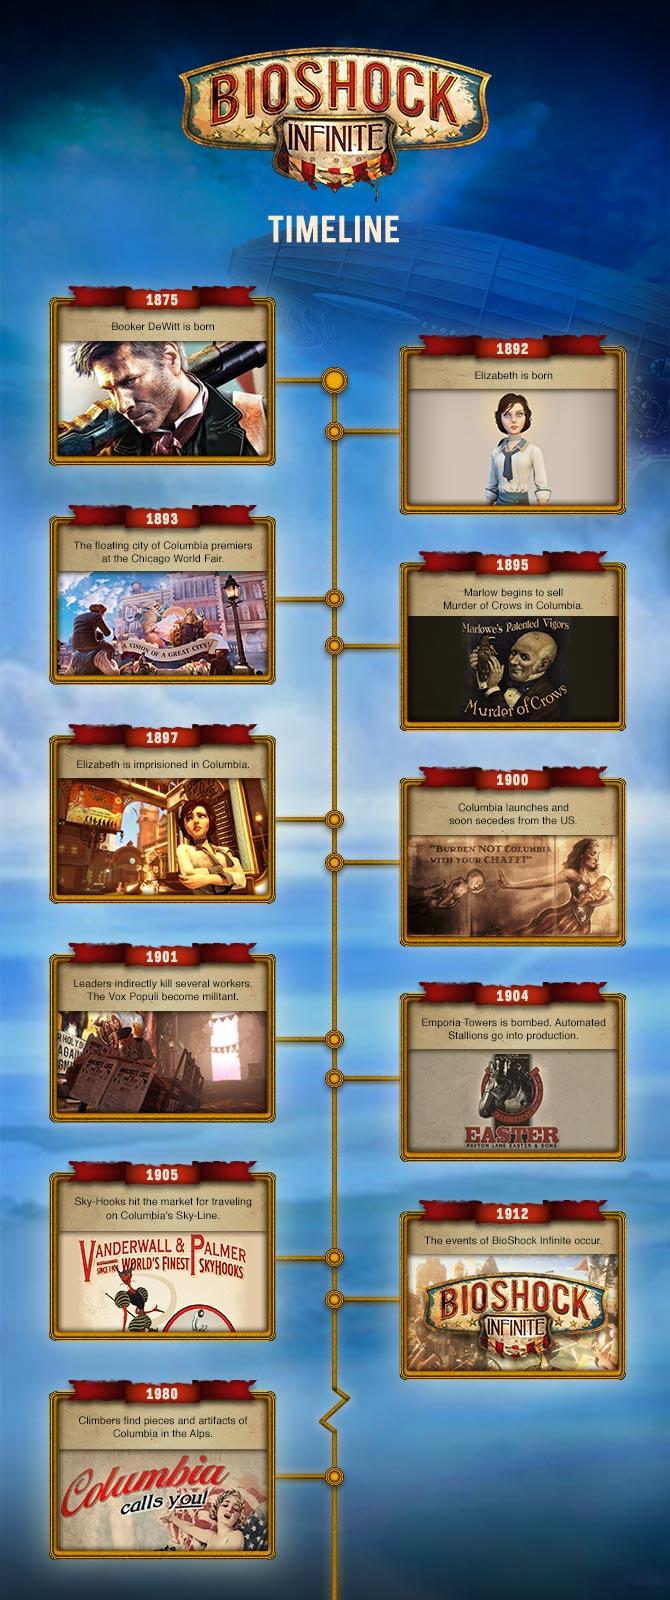 Bioshock Infinite Timeline